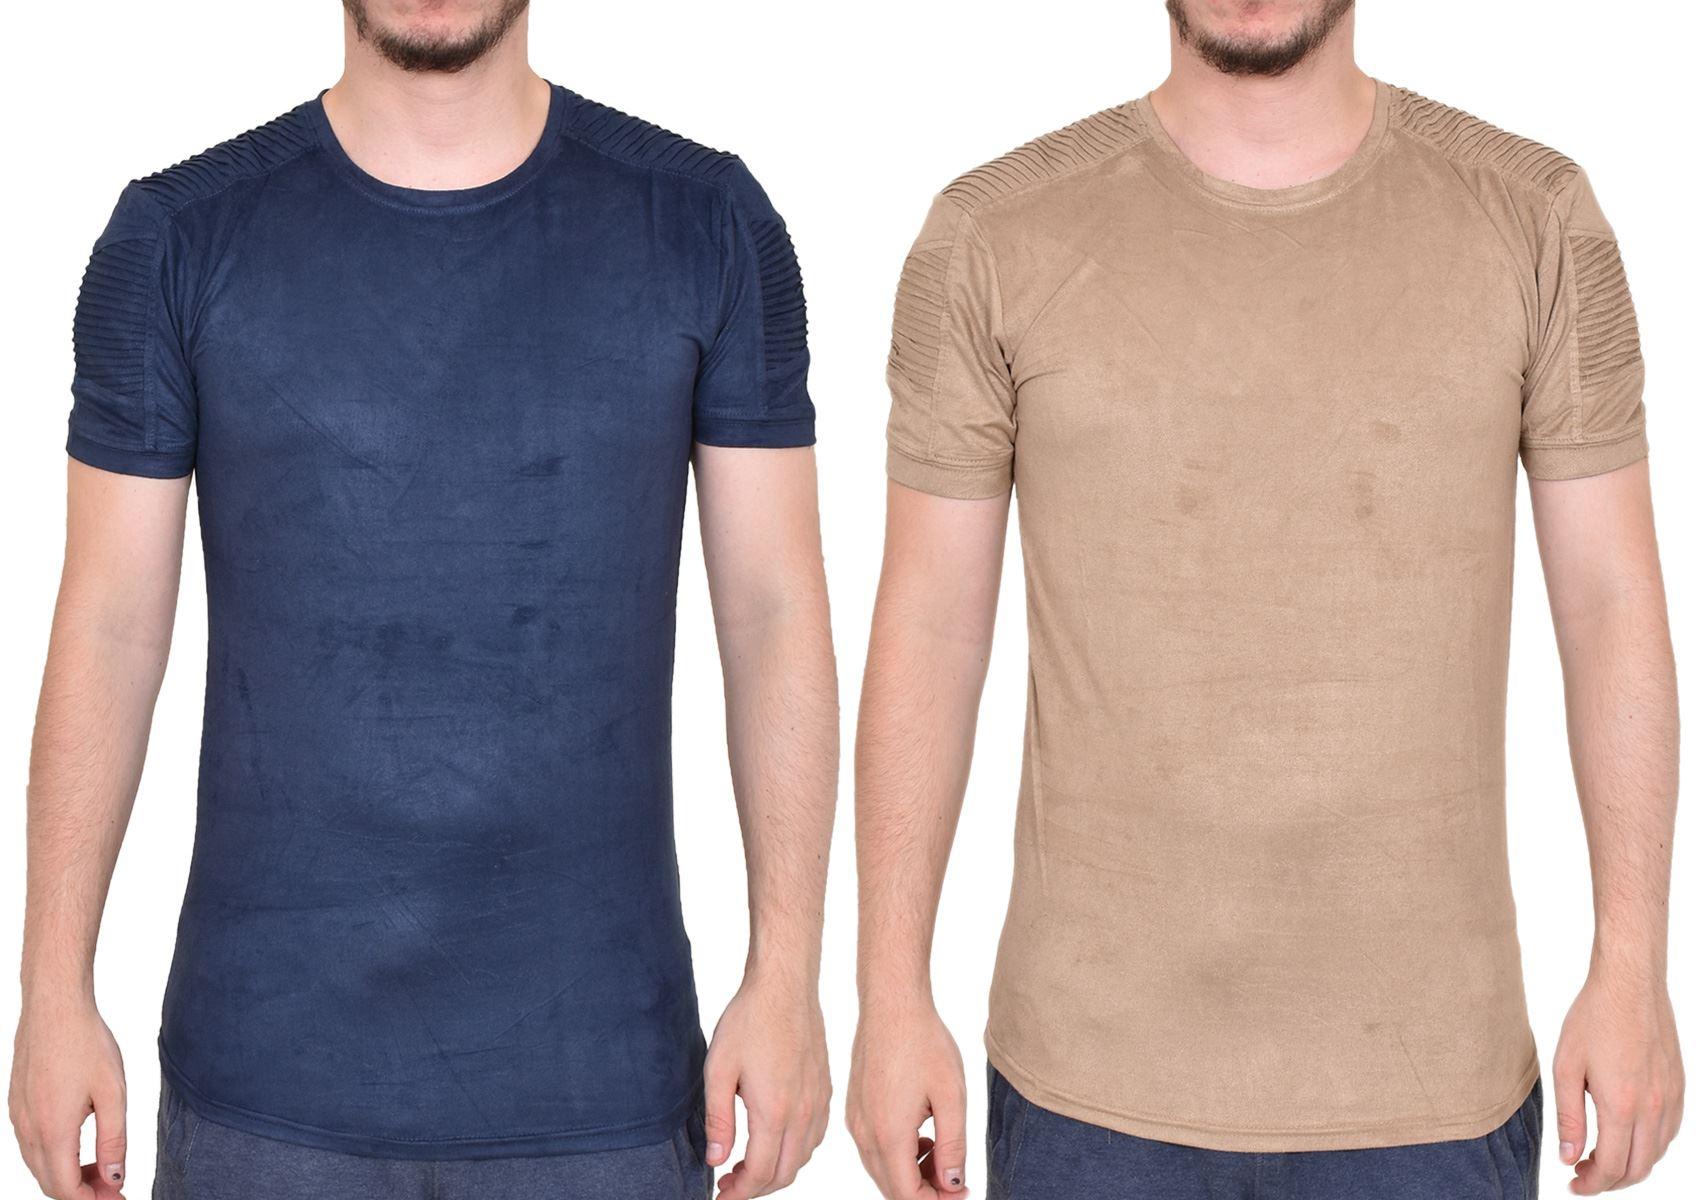 Da Uomo T Shirts LOYALTY /& FAITH POLO Estate T-shirt Tops Multi-Color S-2XL